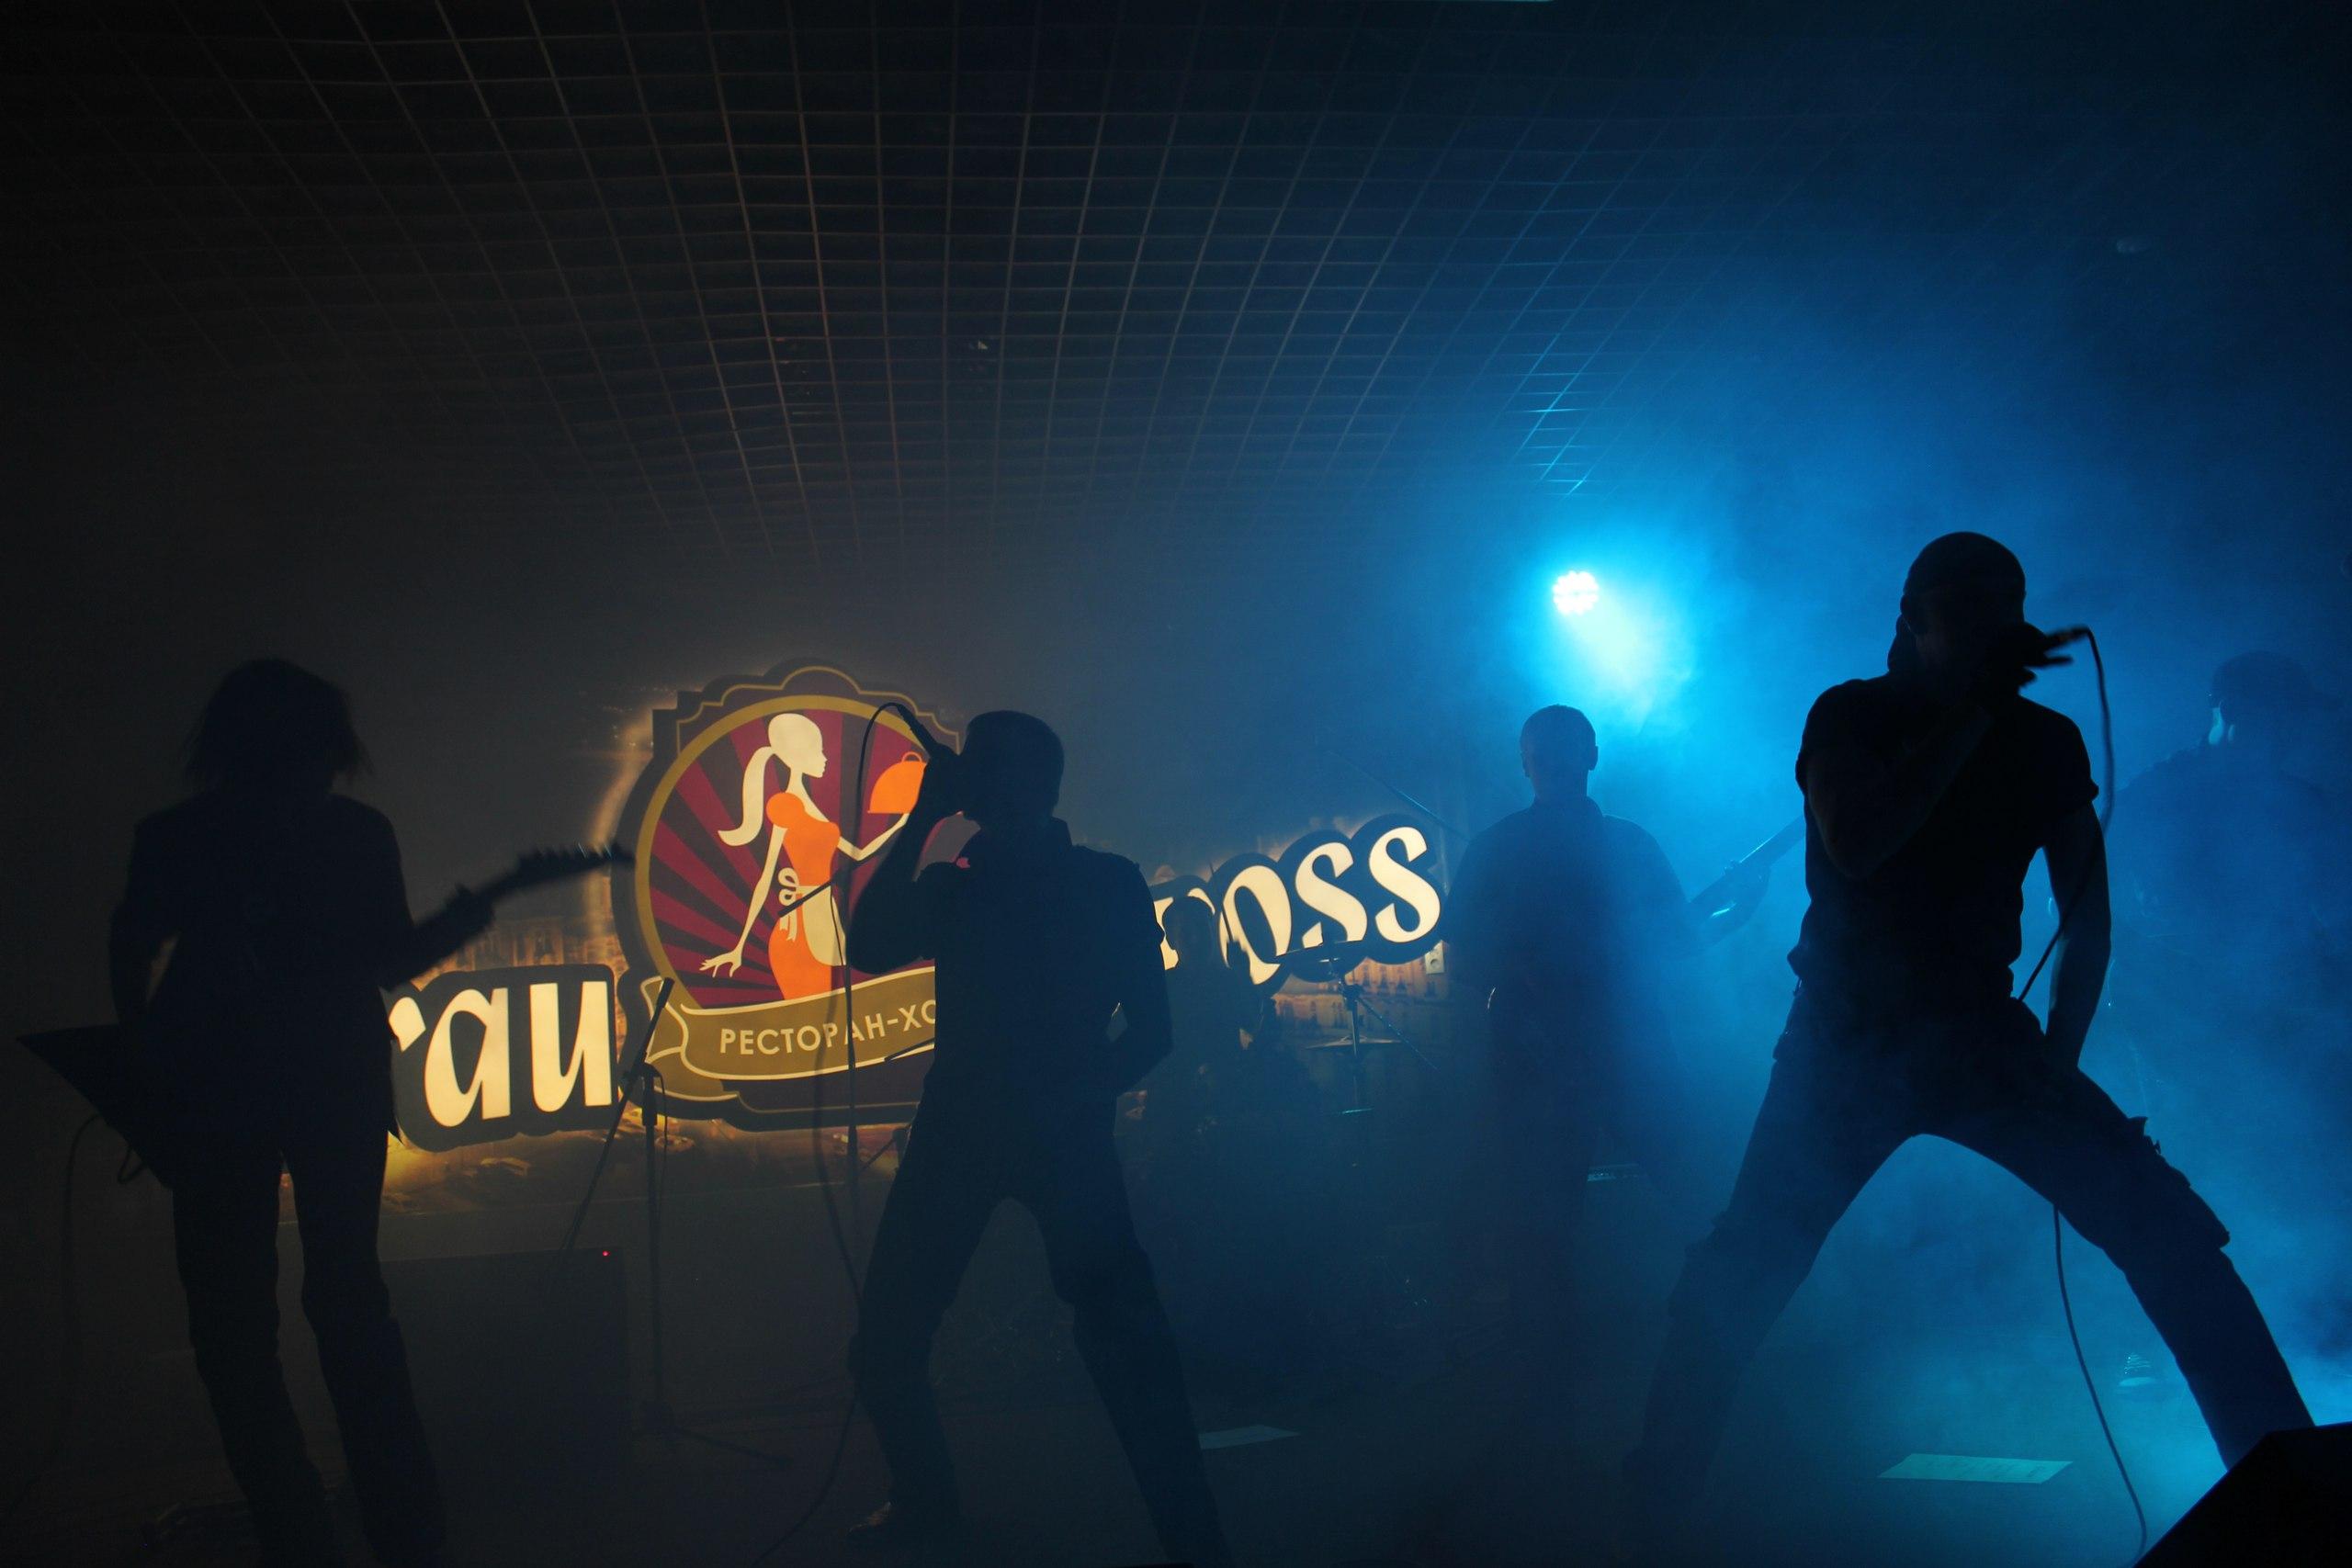 Видео с концерта во Frau Gross 11 октября.